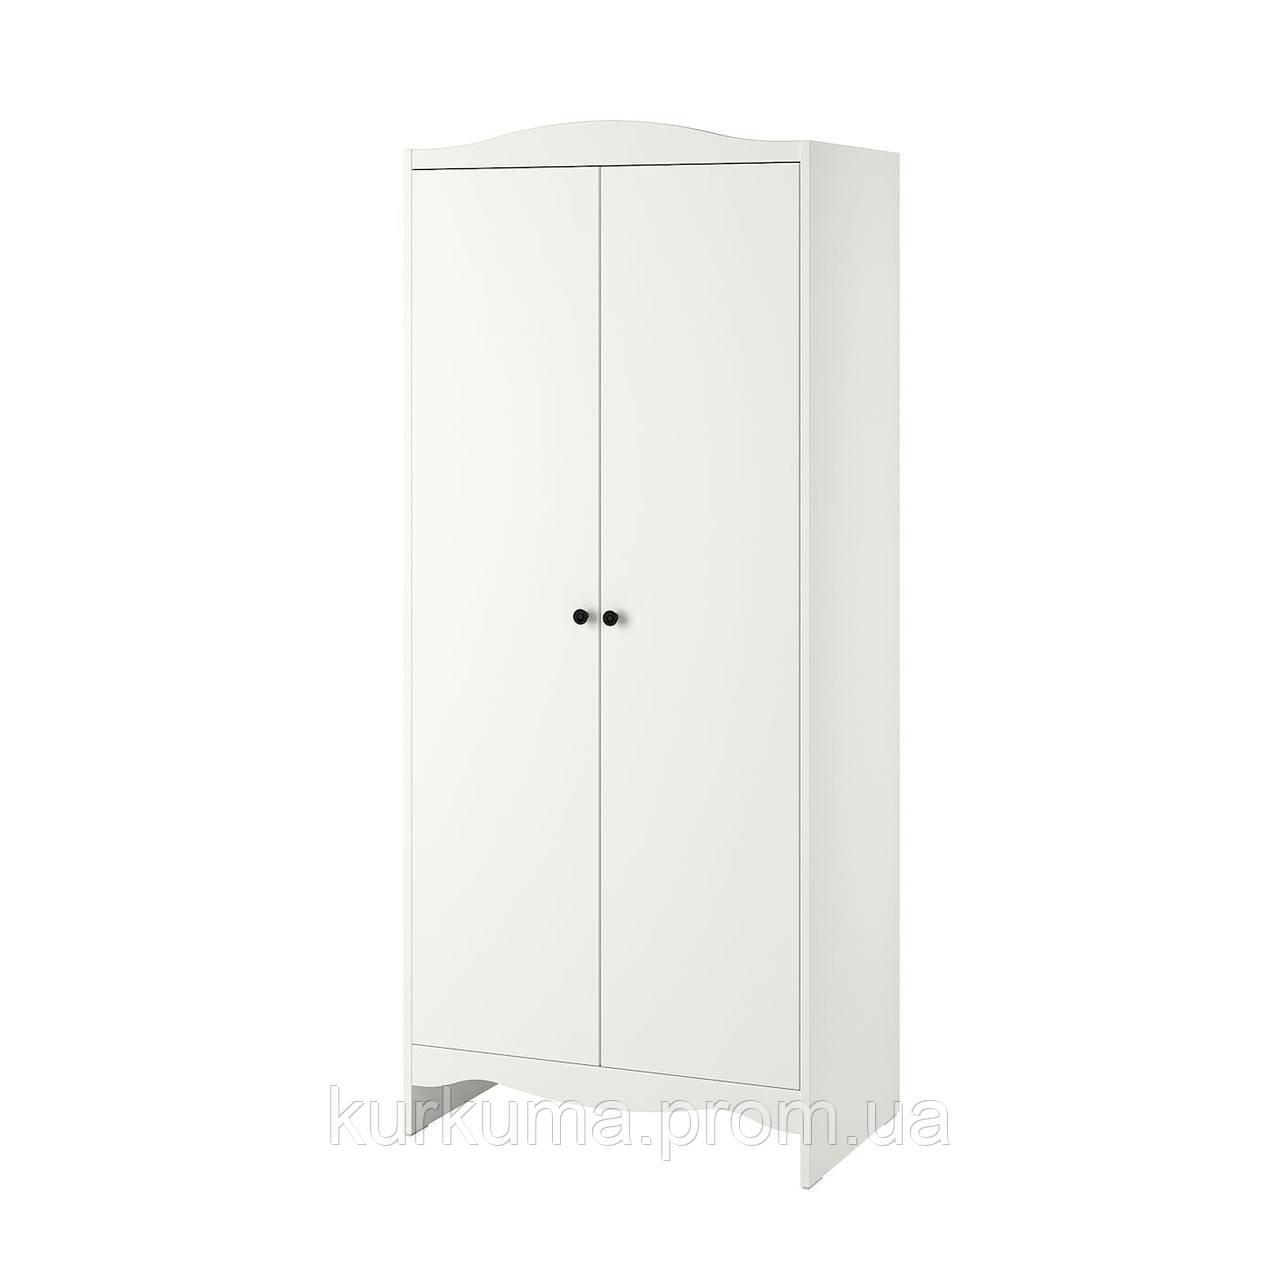 IKEA SMAGORA Шкаф, белый, 80x50x187 см (104.608.88)